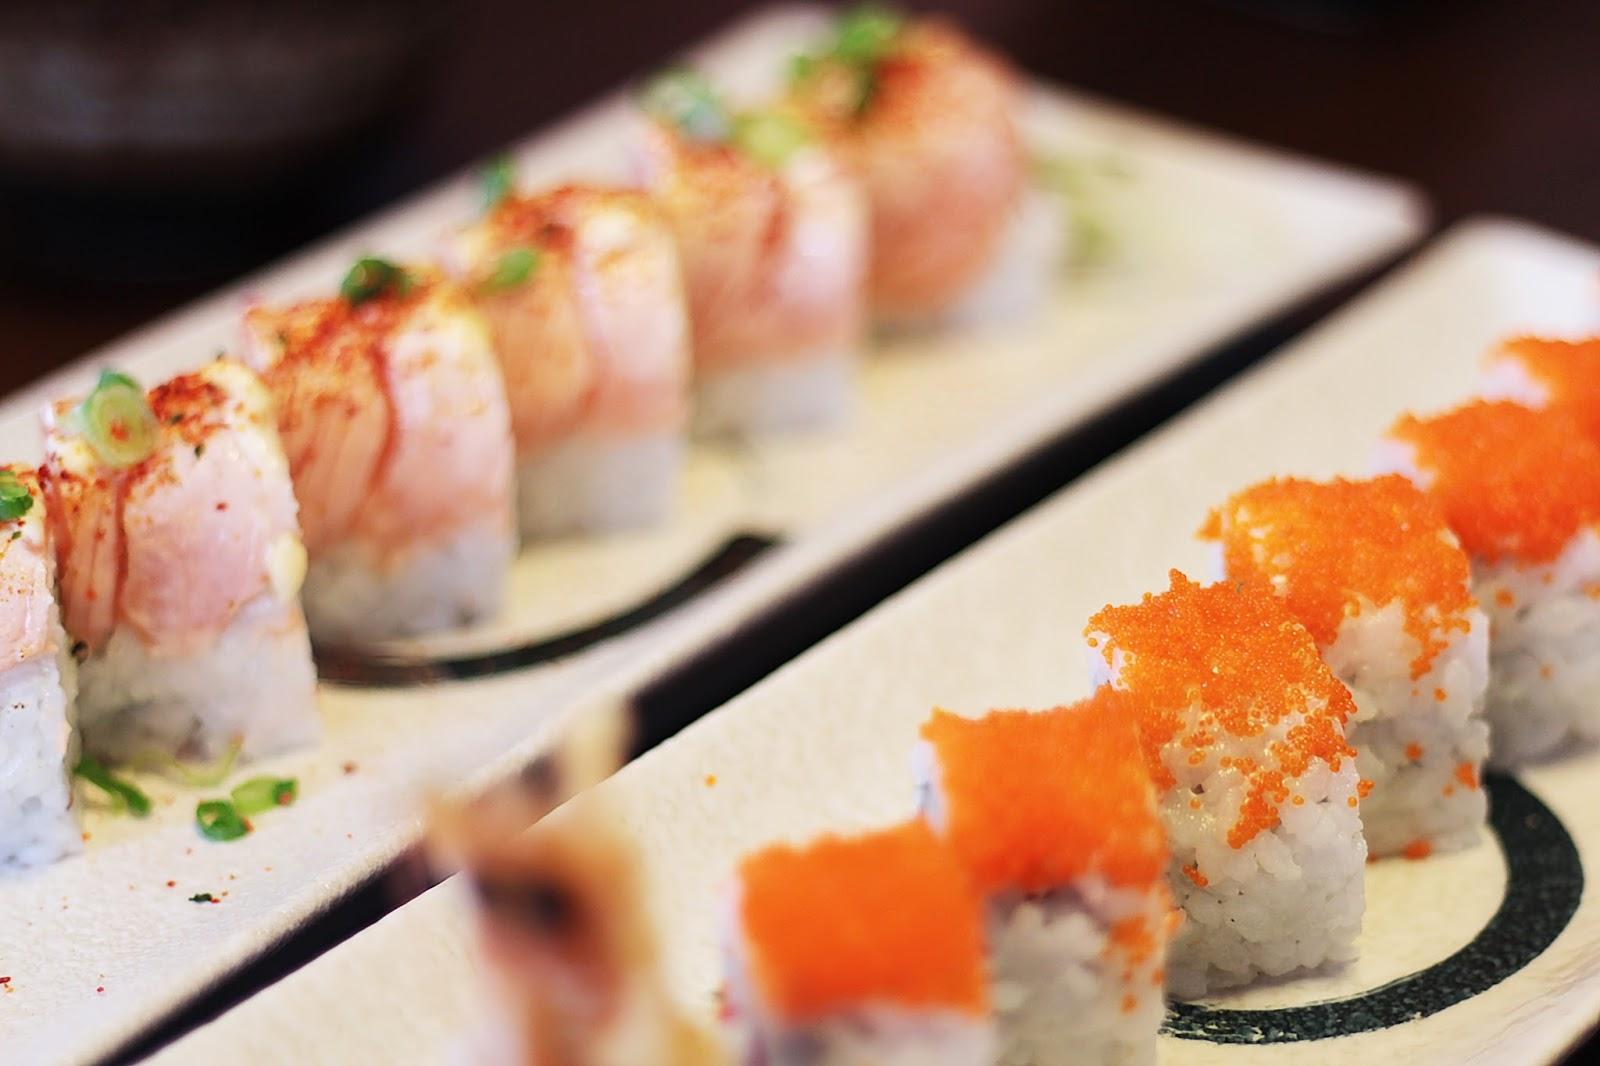 Best Fried Food Yo Sushi